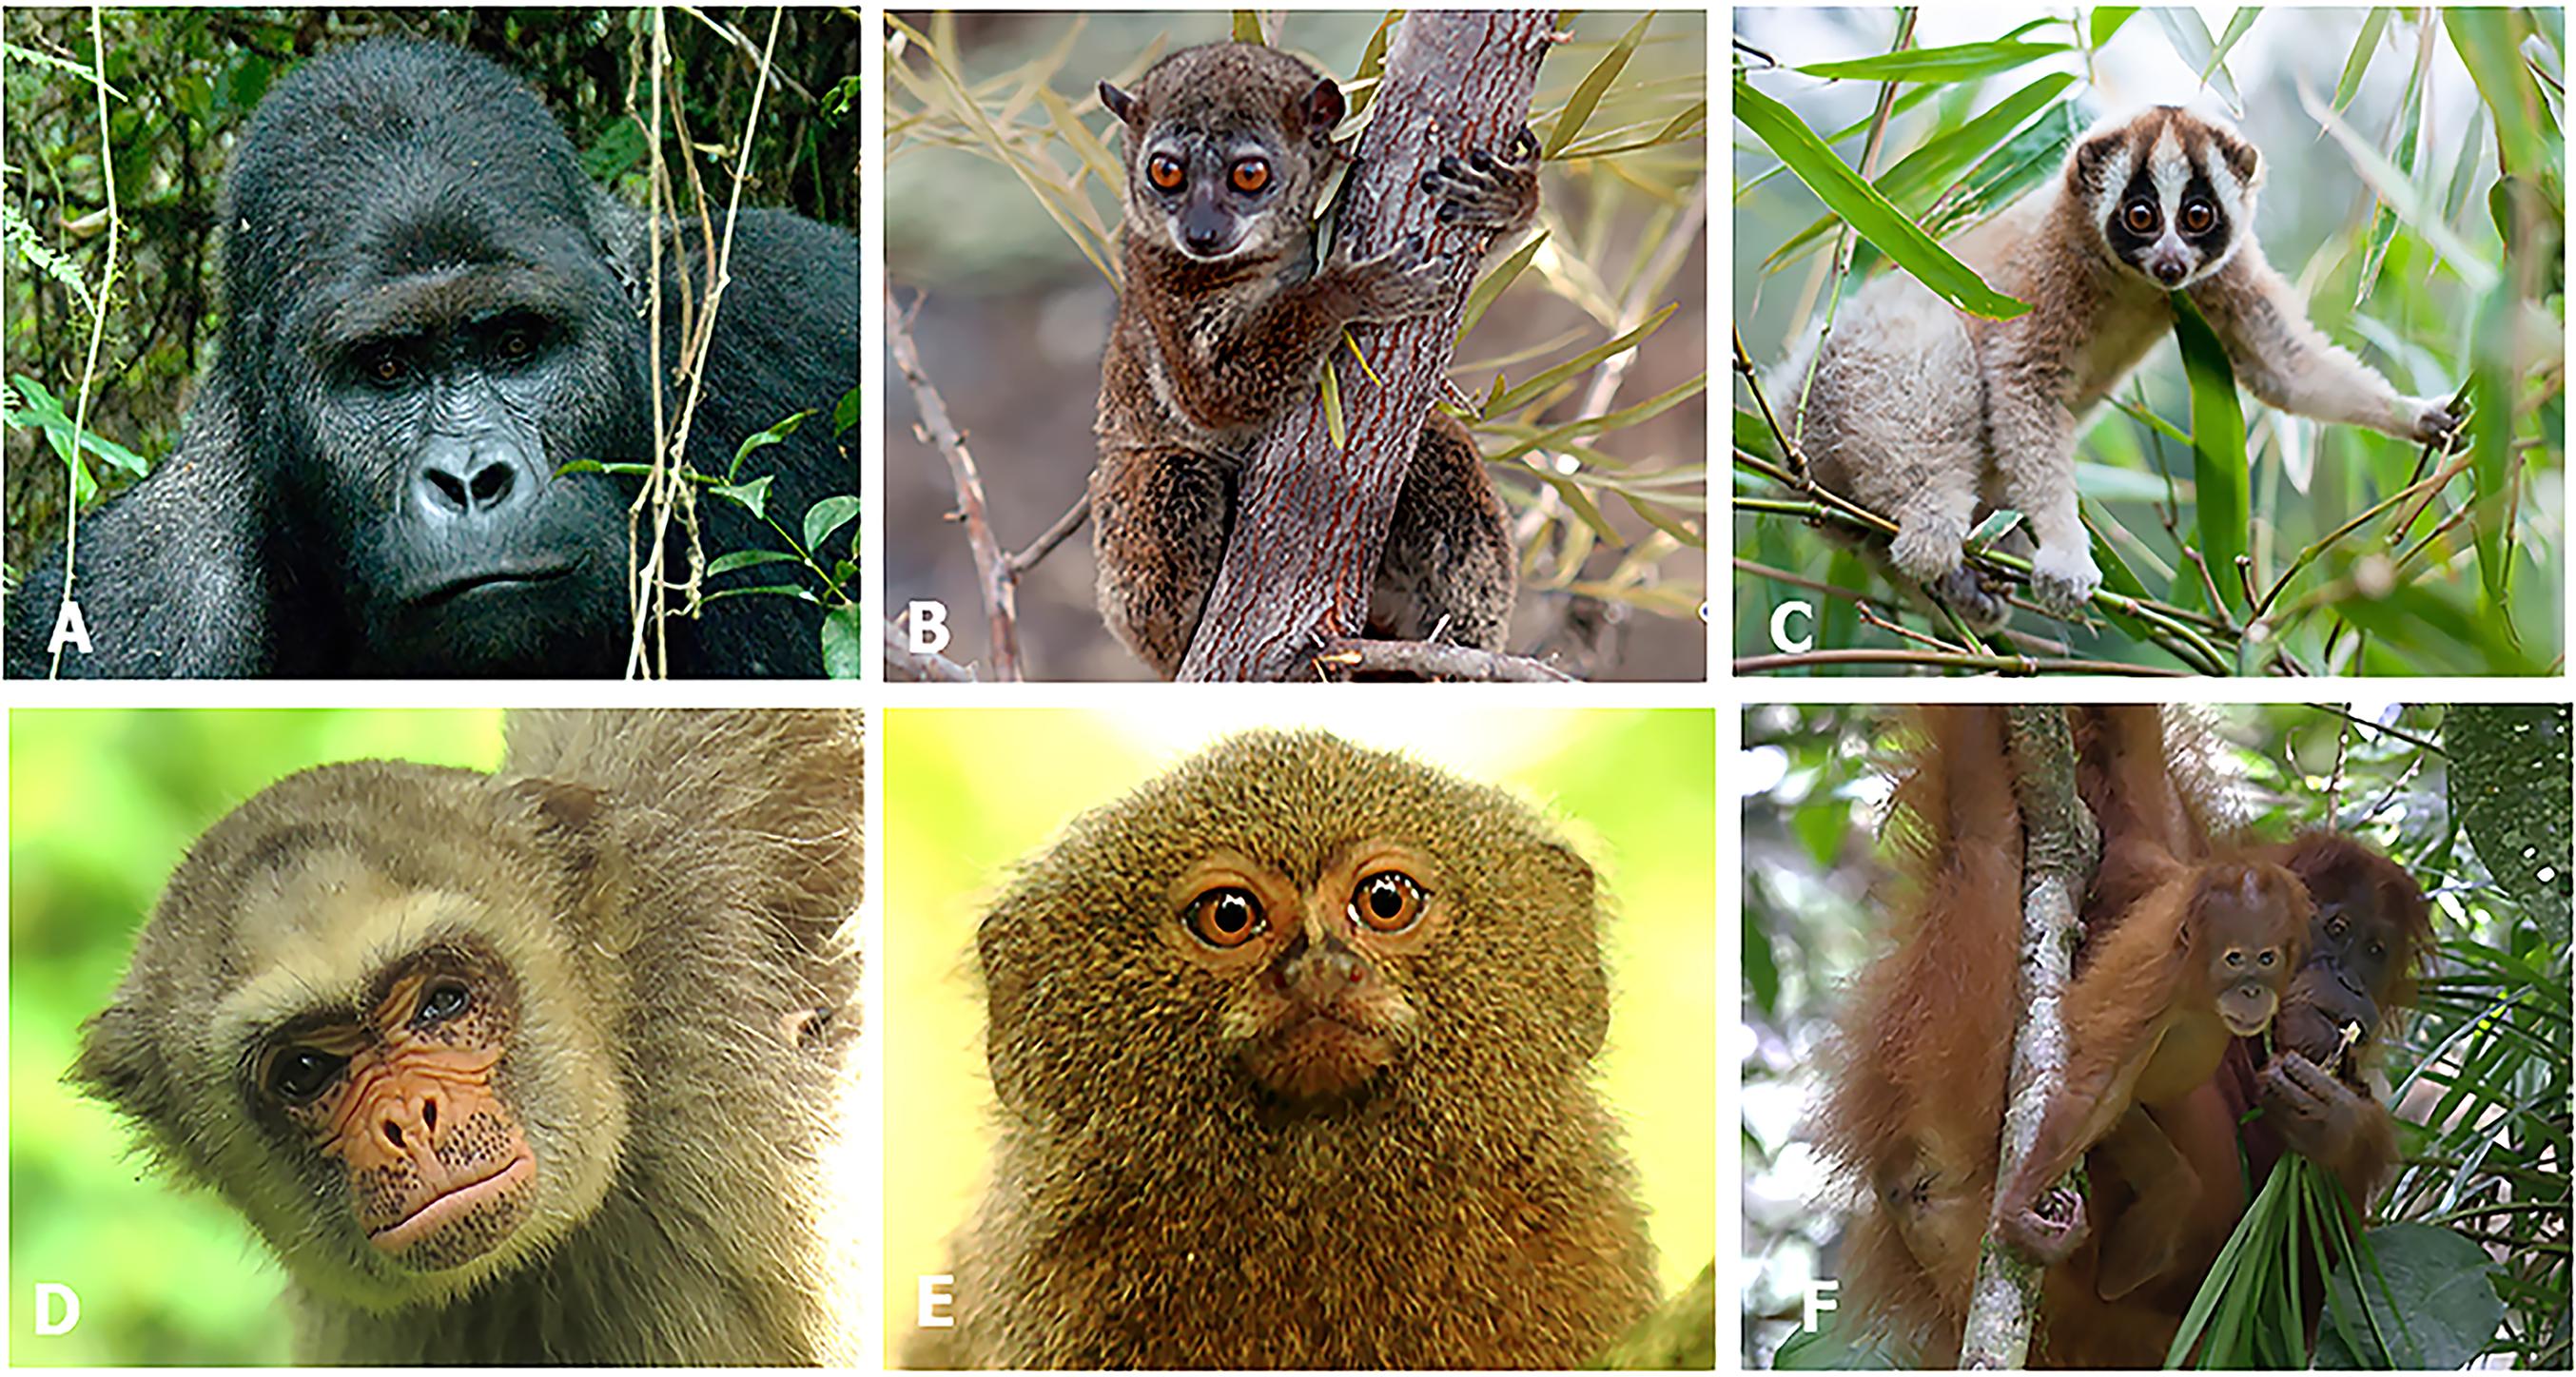 Primates in peril: the significance of Brazil, Madagascar